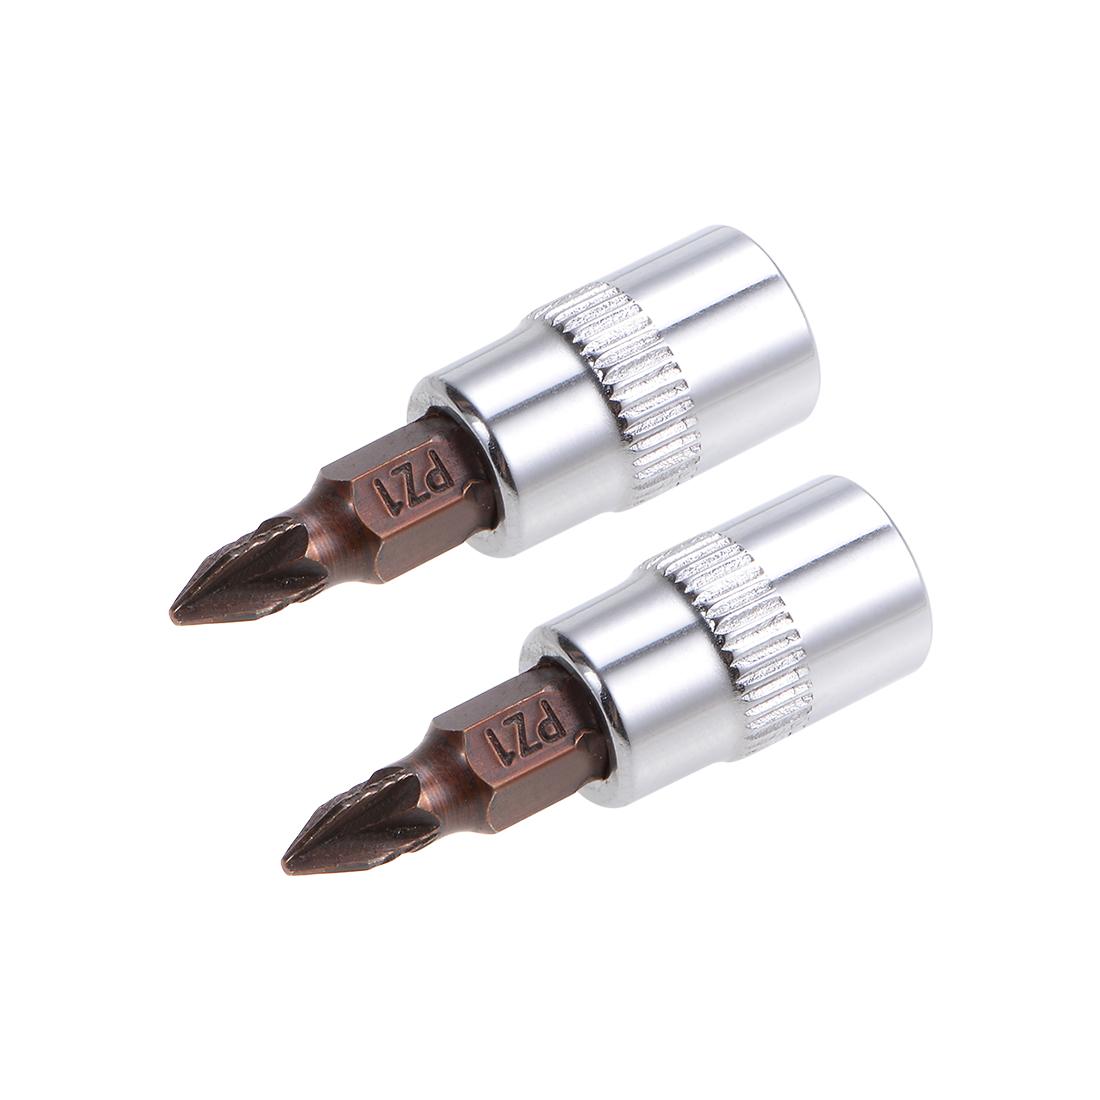 1/4-Inch Drive Bit Socket PZ1 S2 Steel 38mm Length 2 Pcs